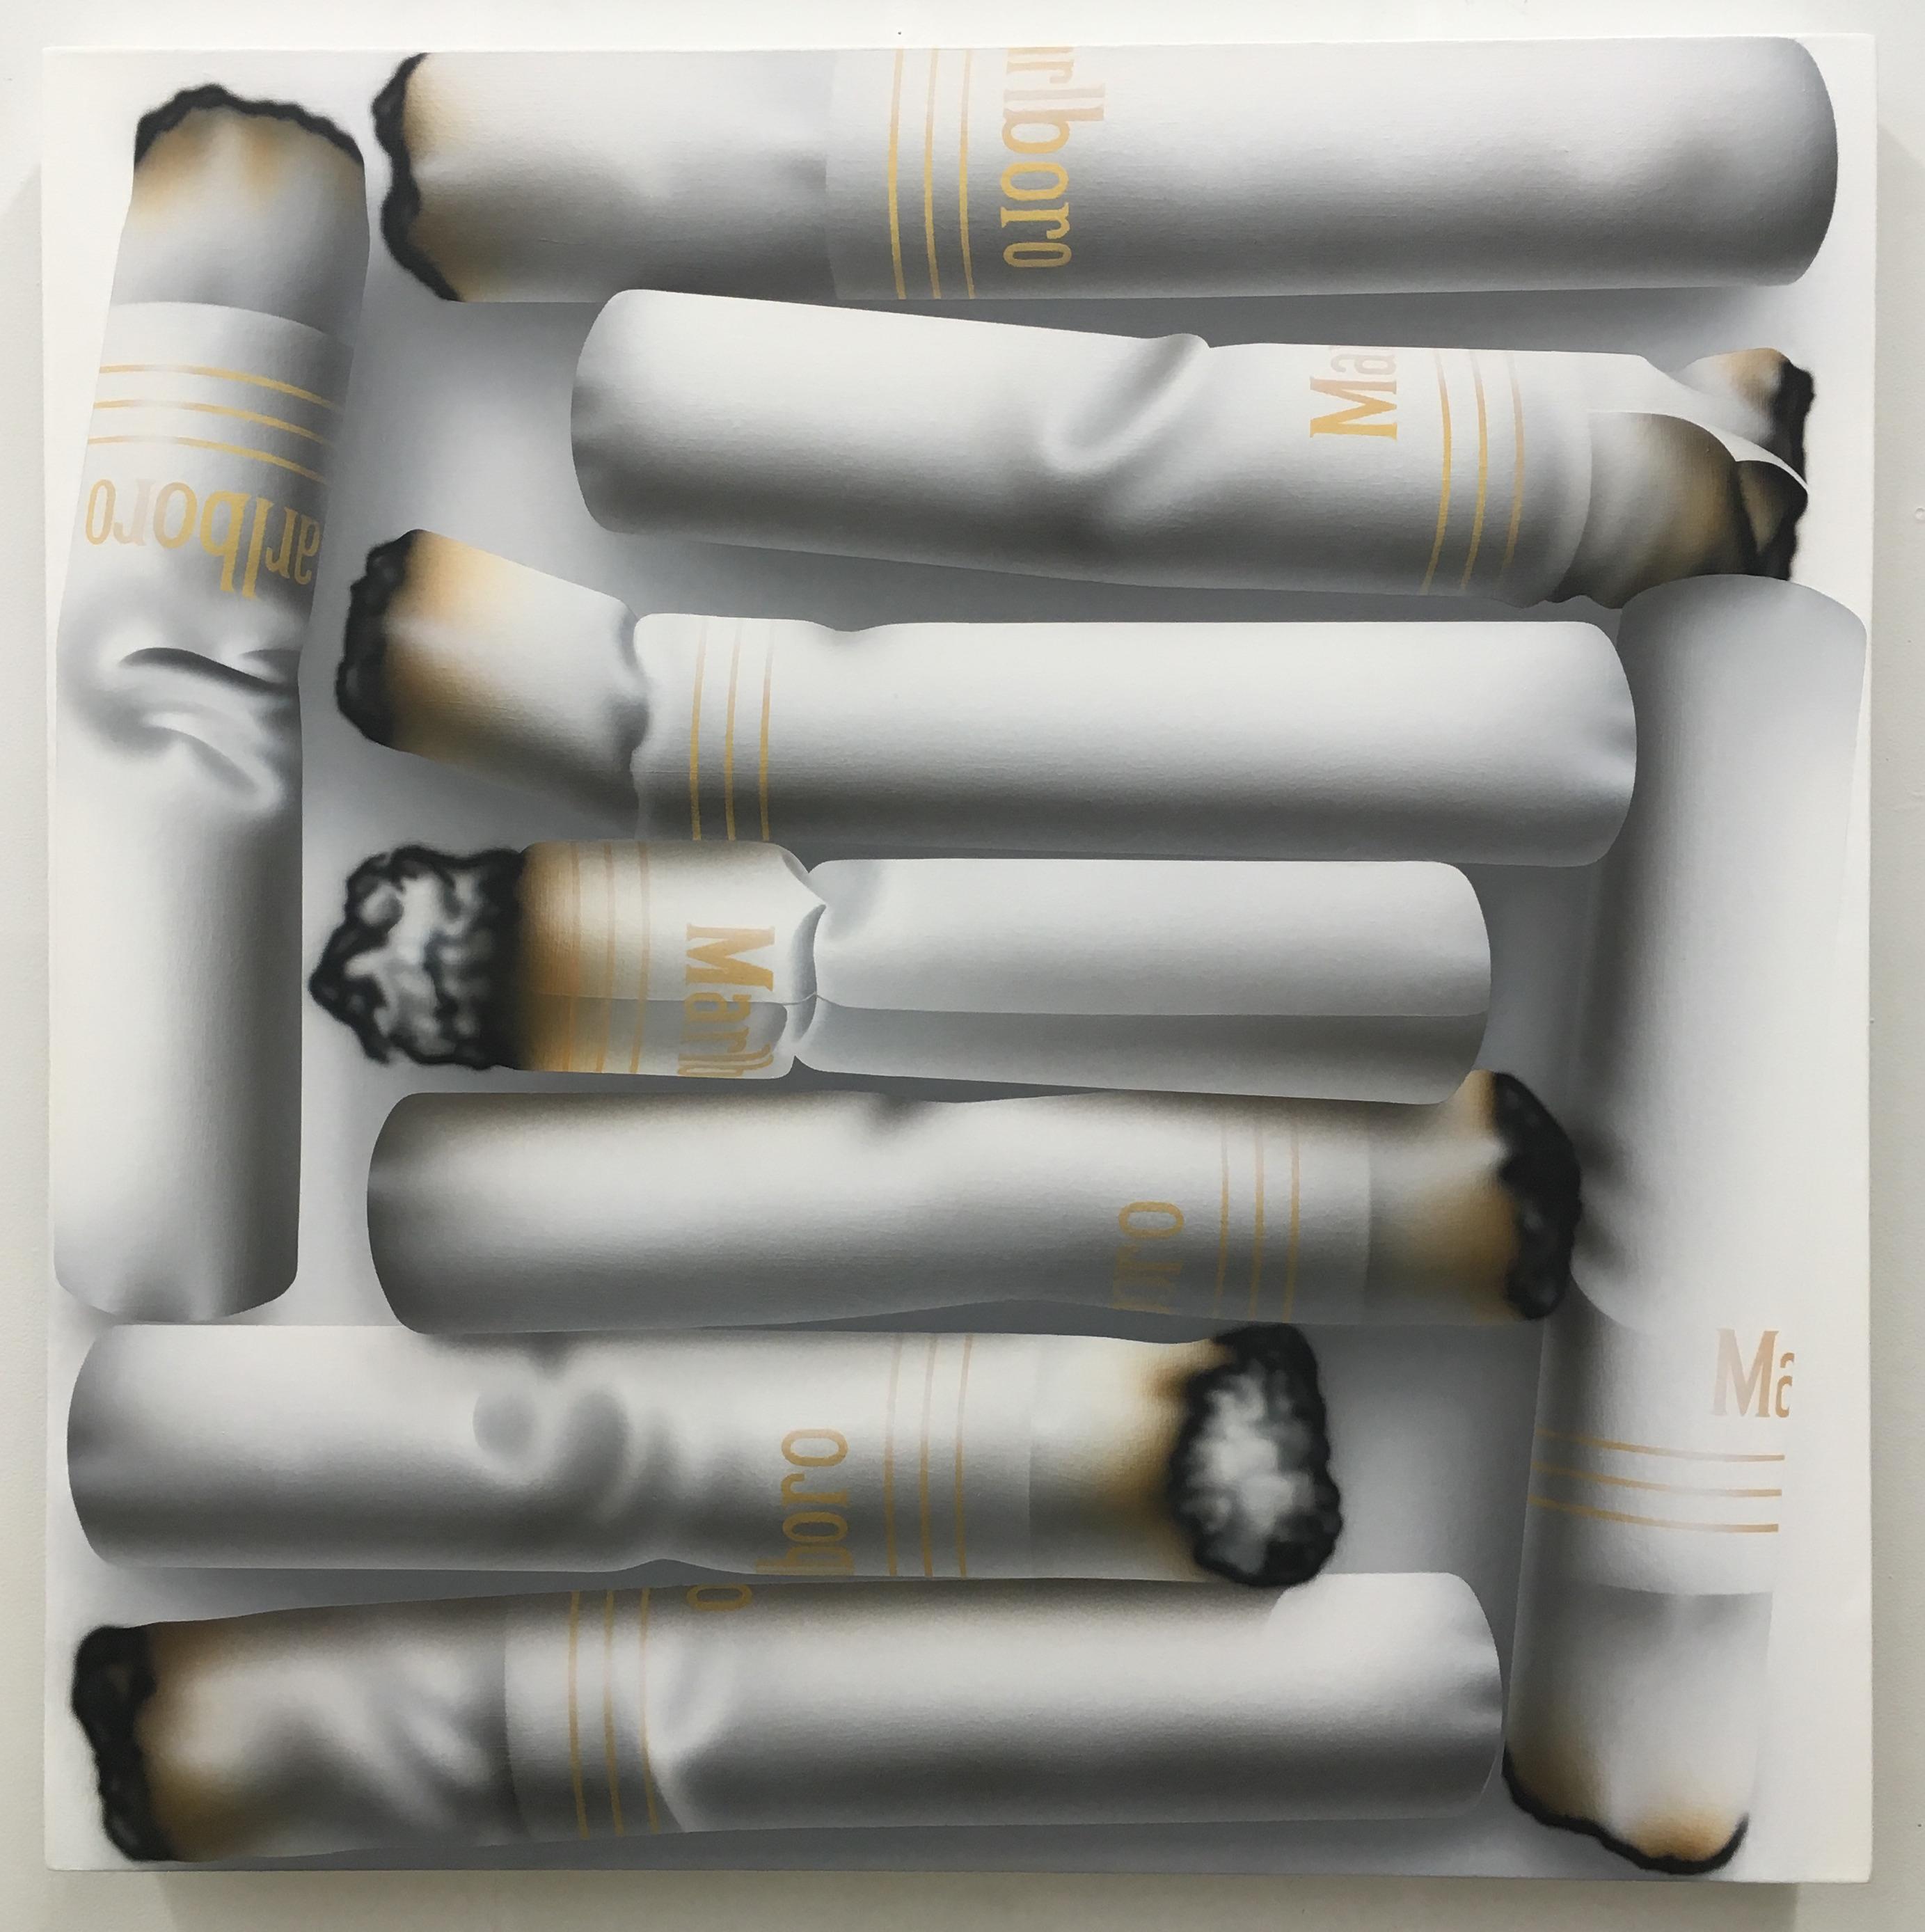 Rachel Hecker, Cigarette arrangement #2, 2016, acrylic on canvas, 30 x 30 inches